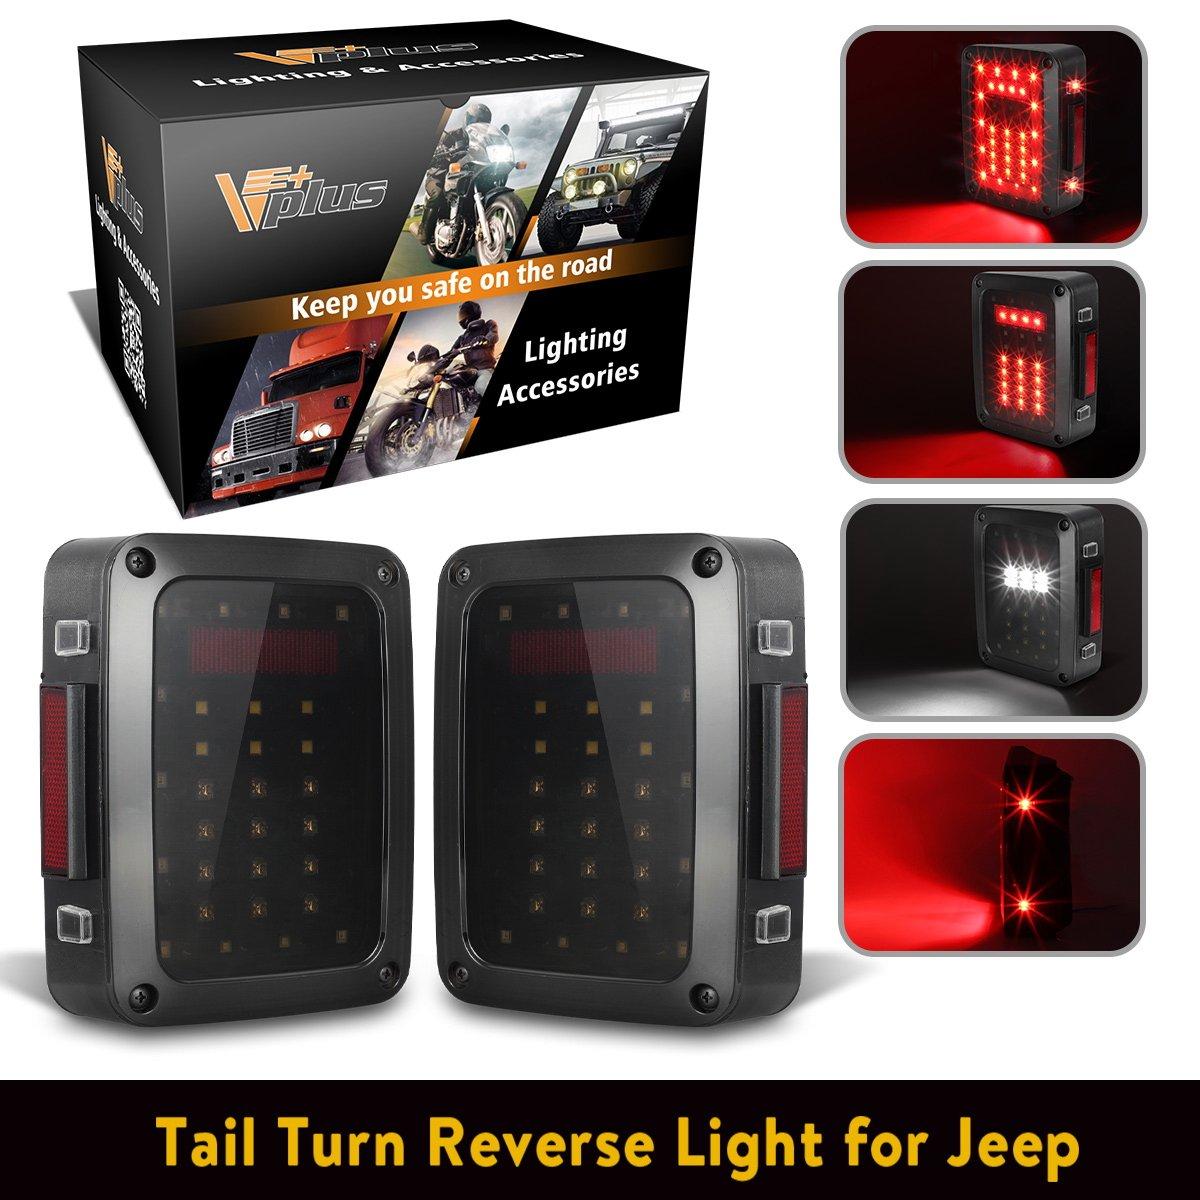 Vplus Led Tail Lights Assembly Smoke Lens Brake Turn Jeep Wrangler Tj Reverse Stop Drl Light Lamp Replacement For 2007 2017 Yj Jk Cj Jku Sports